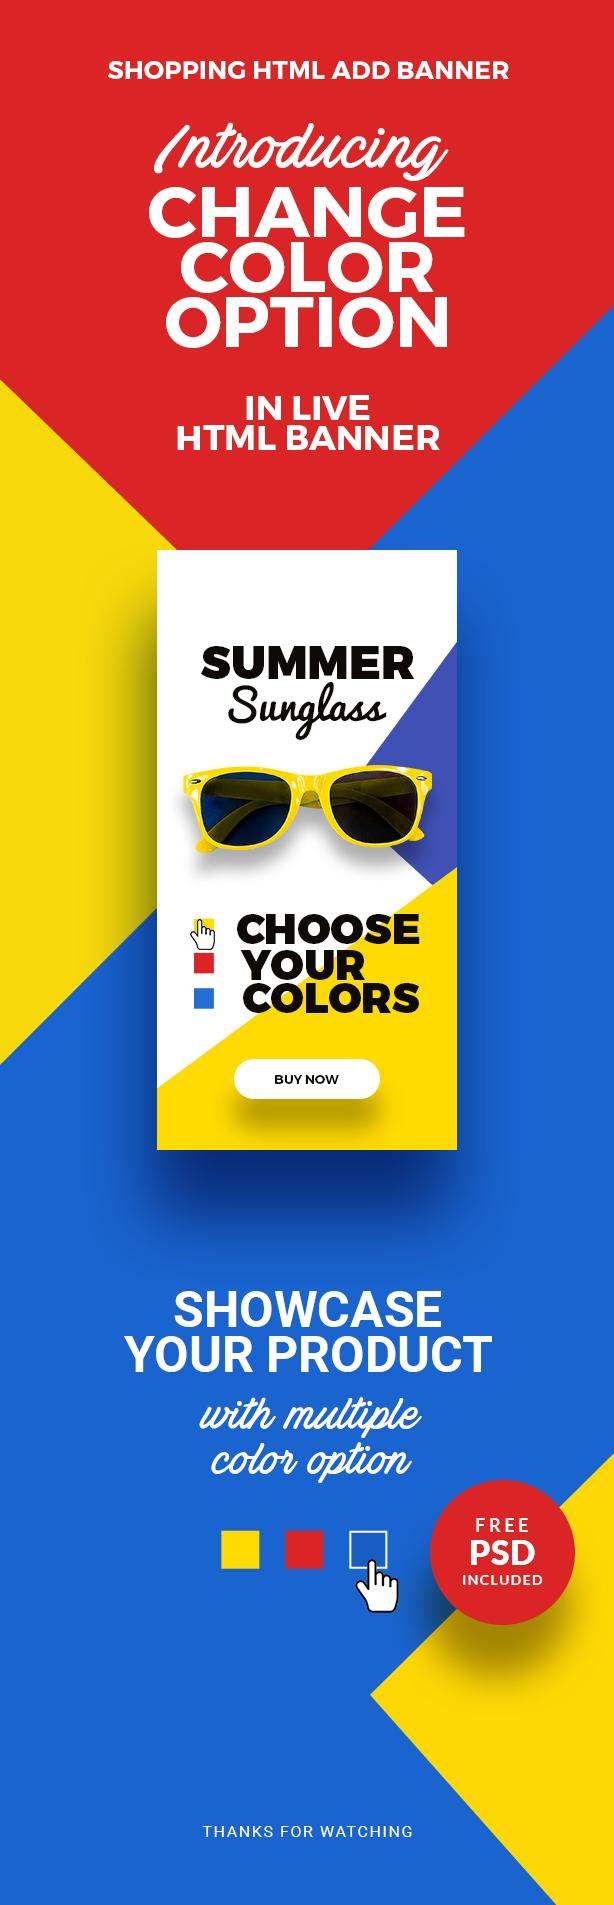 Shopping - HTML5 Animated Banner 20 Advance - 1